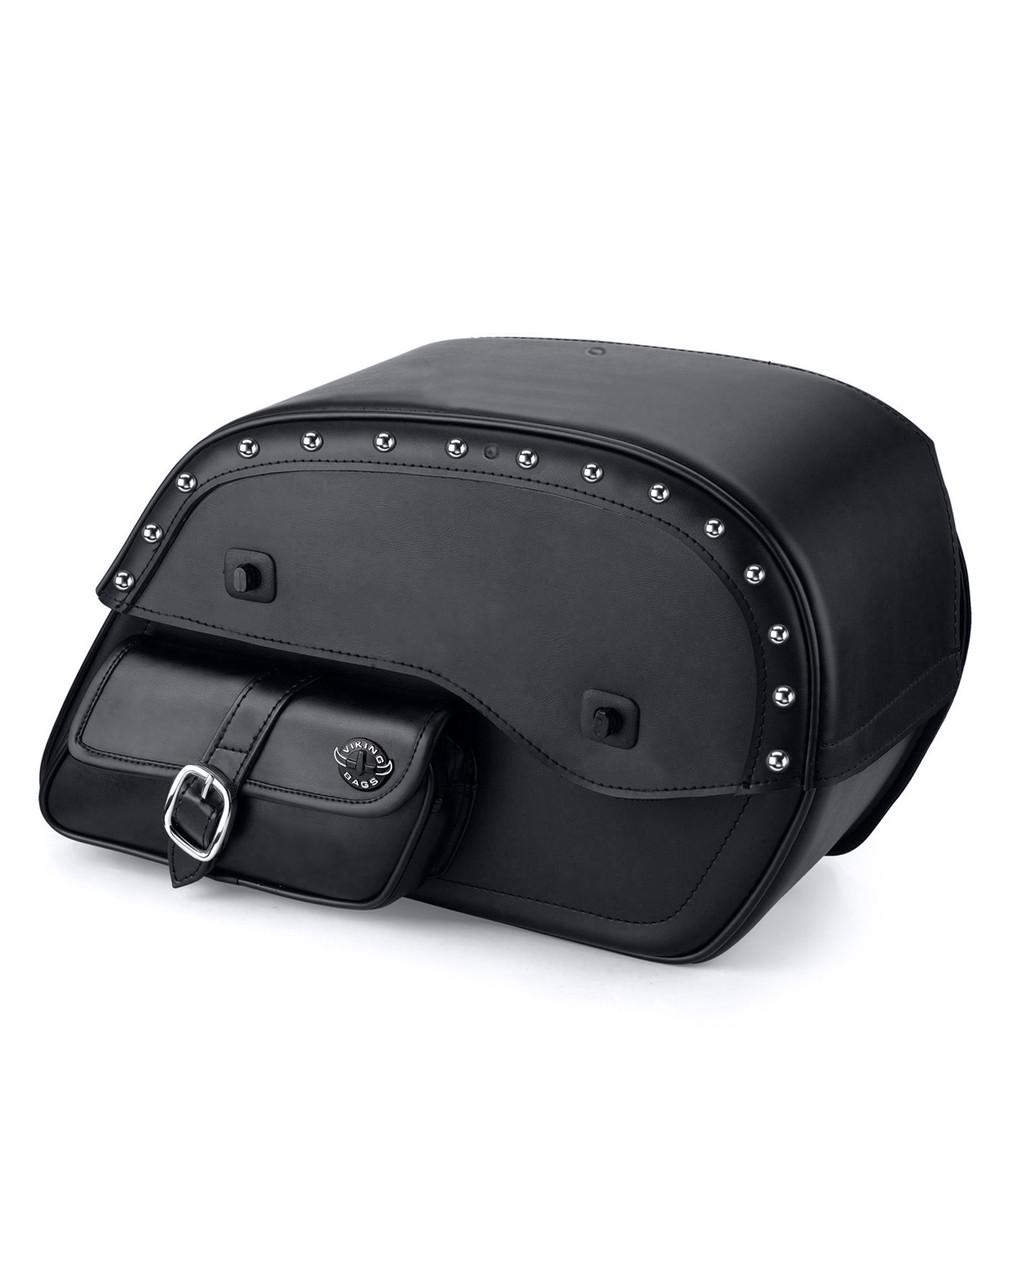 Honda 1100 Shadow Aero SS Side Pocket Studded Motorcycle Saddlebags Main Bag View